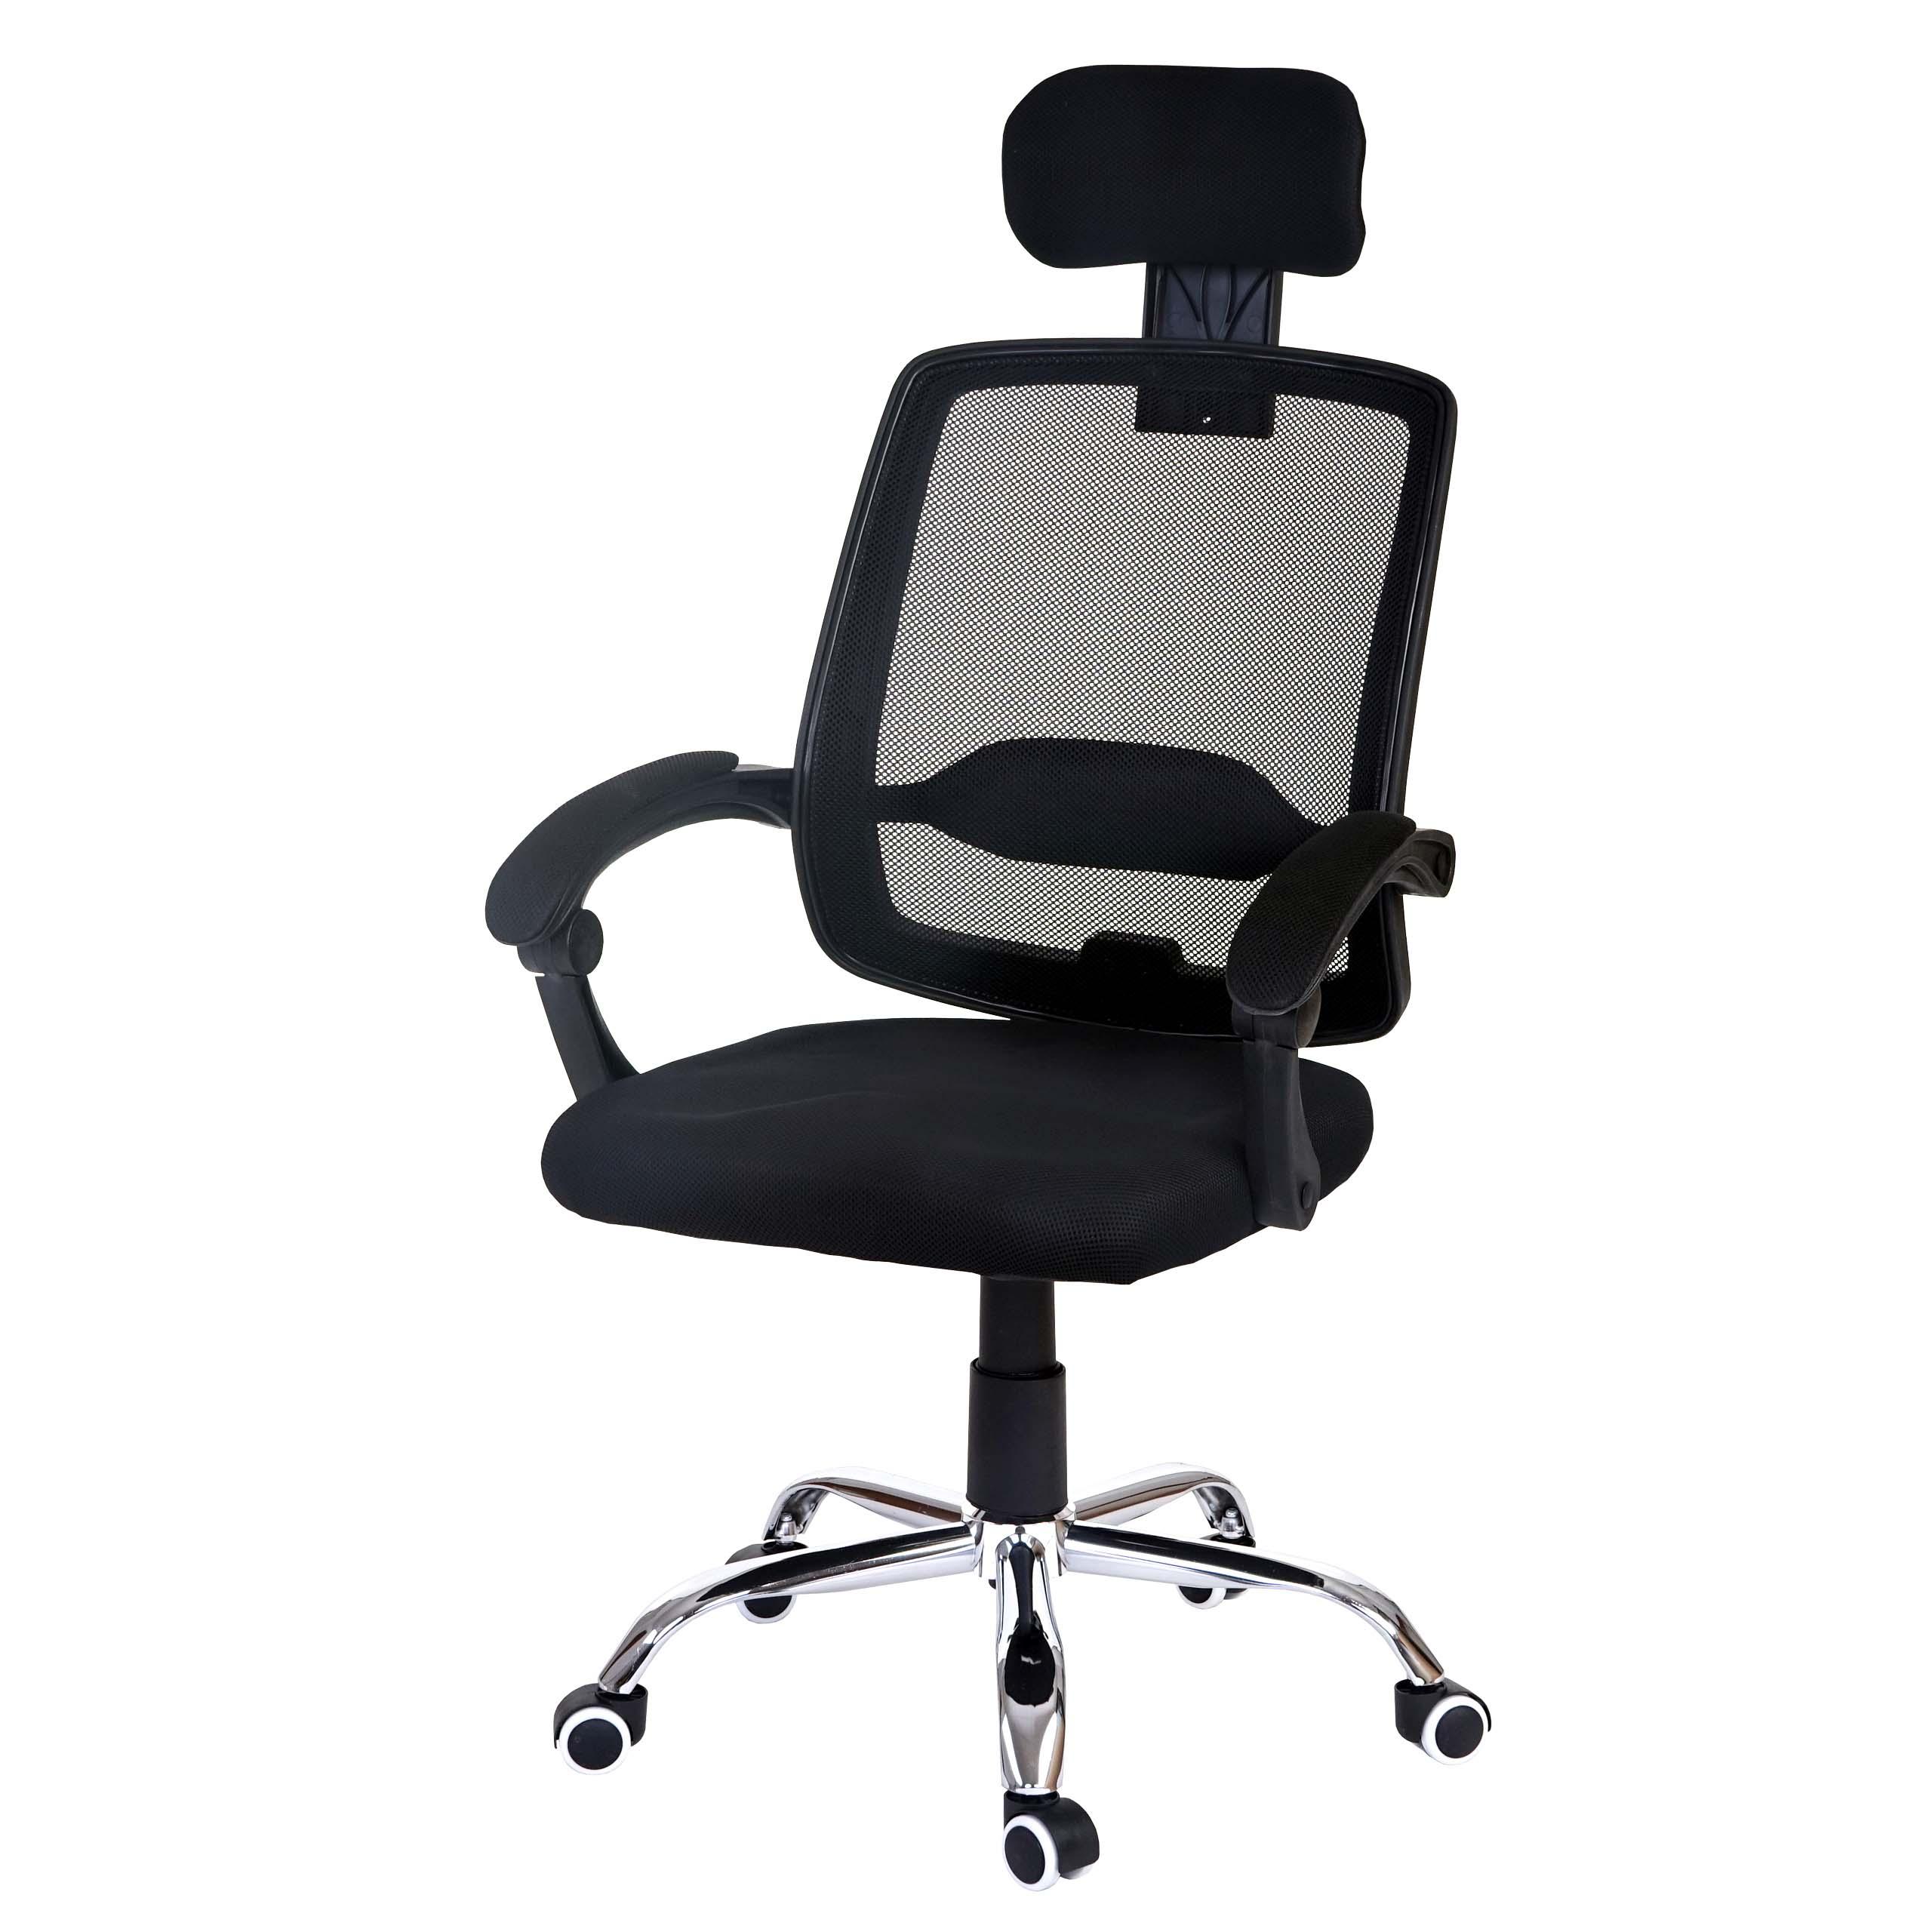 Fauteuil de bureau arendal chaise rotative appui t te - Fauteuil de bureau avec appui tete ...